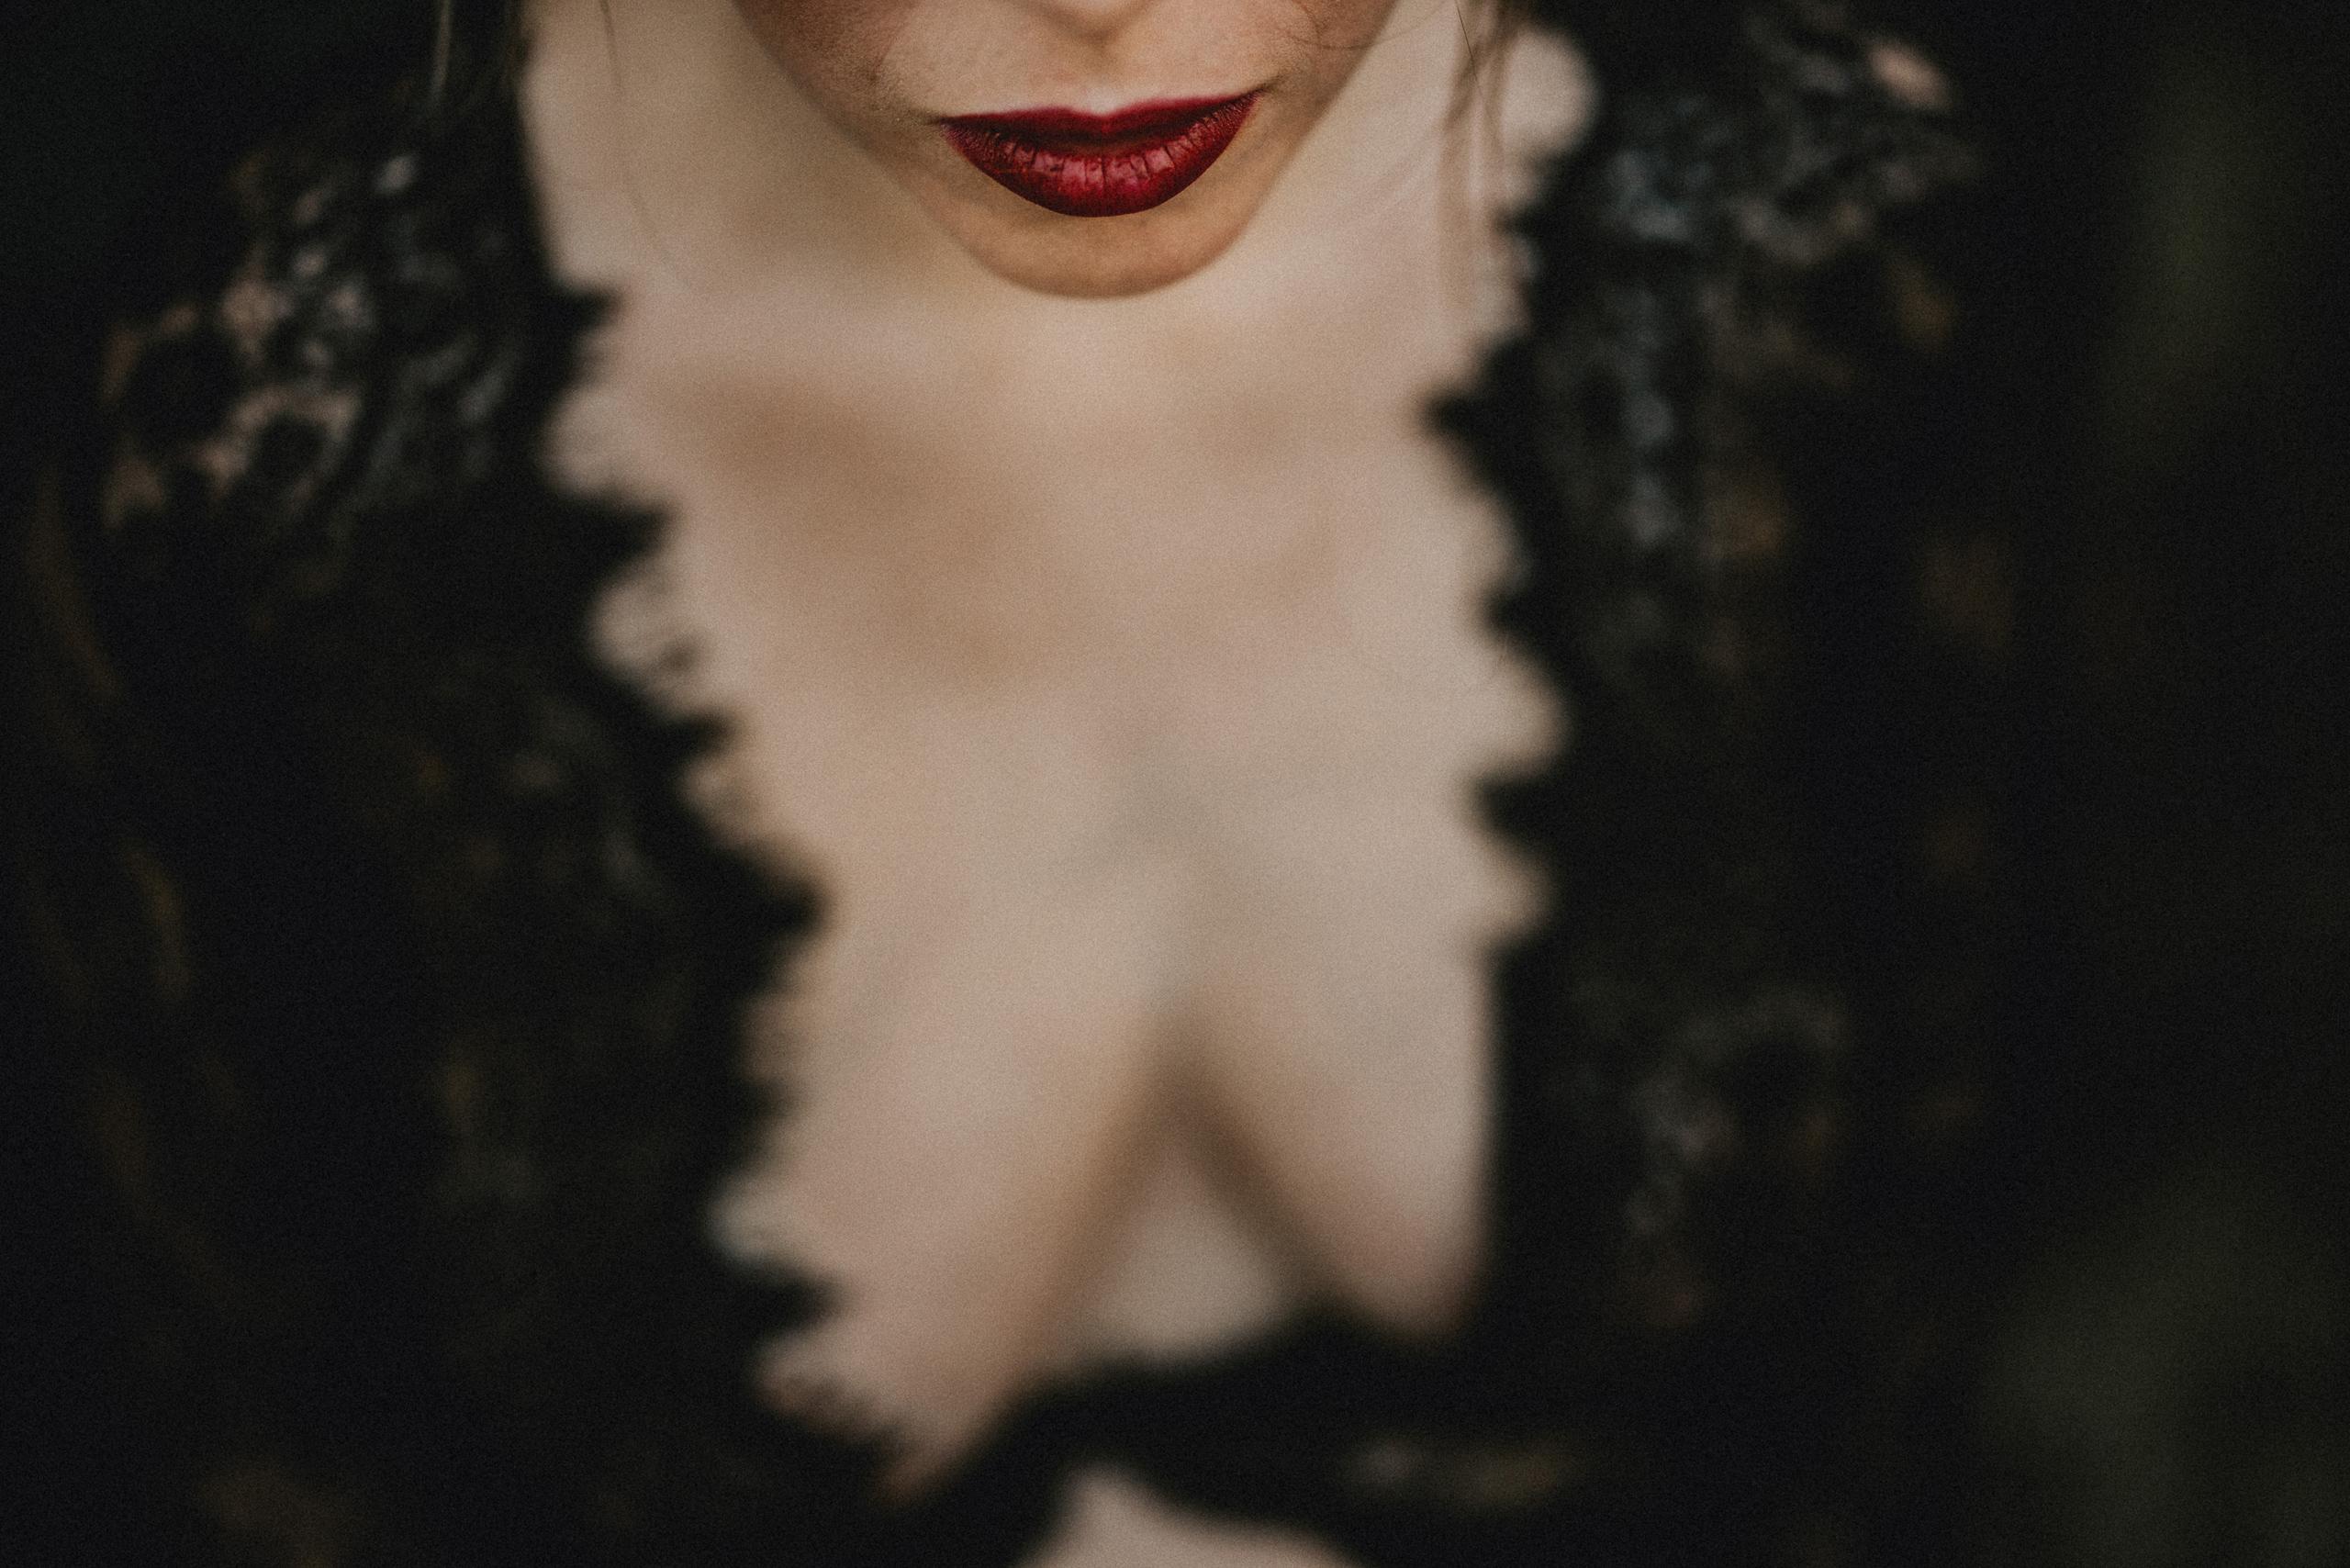 red lipstick maternity boudoir photos style sexy outdoor